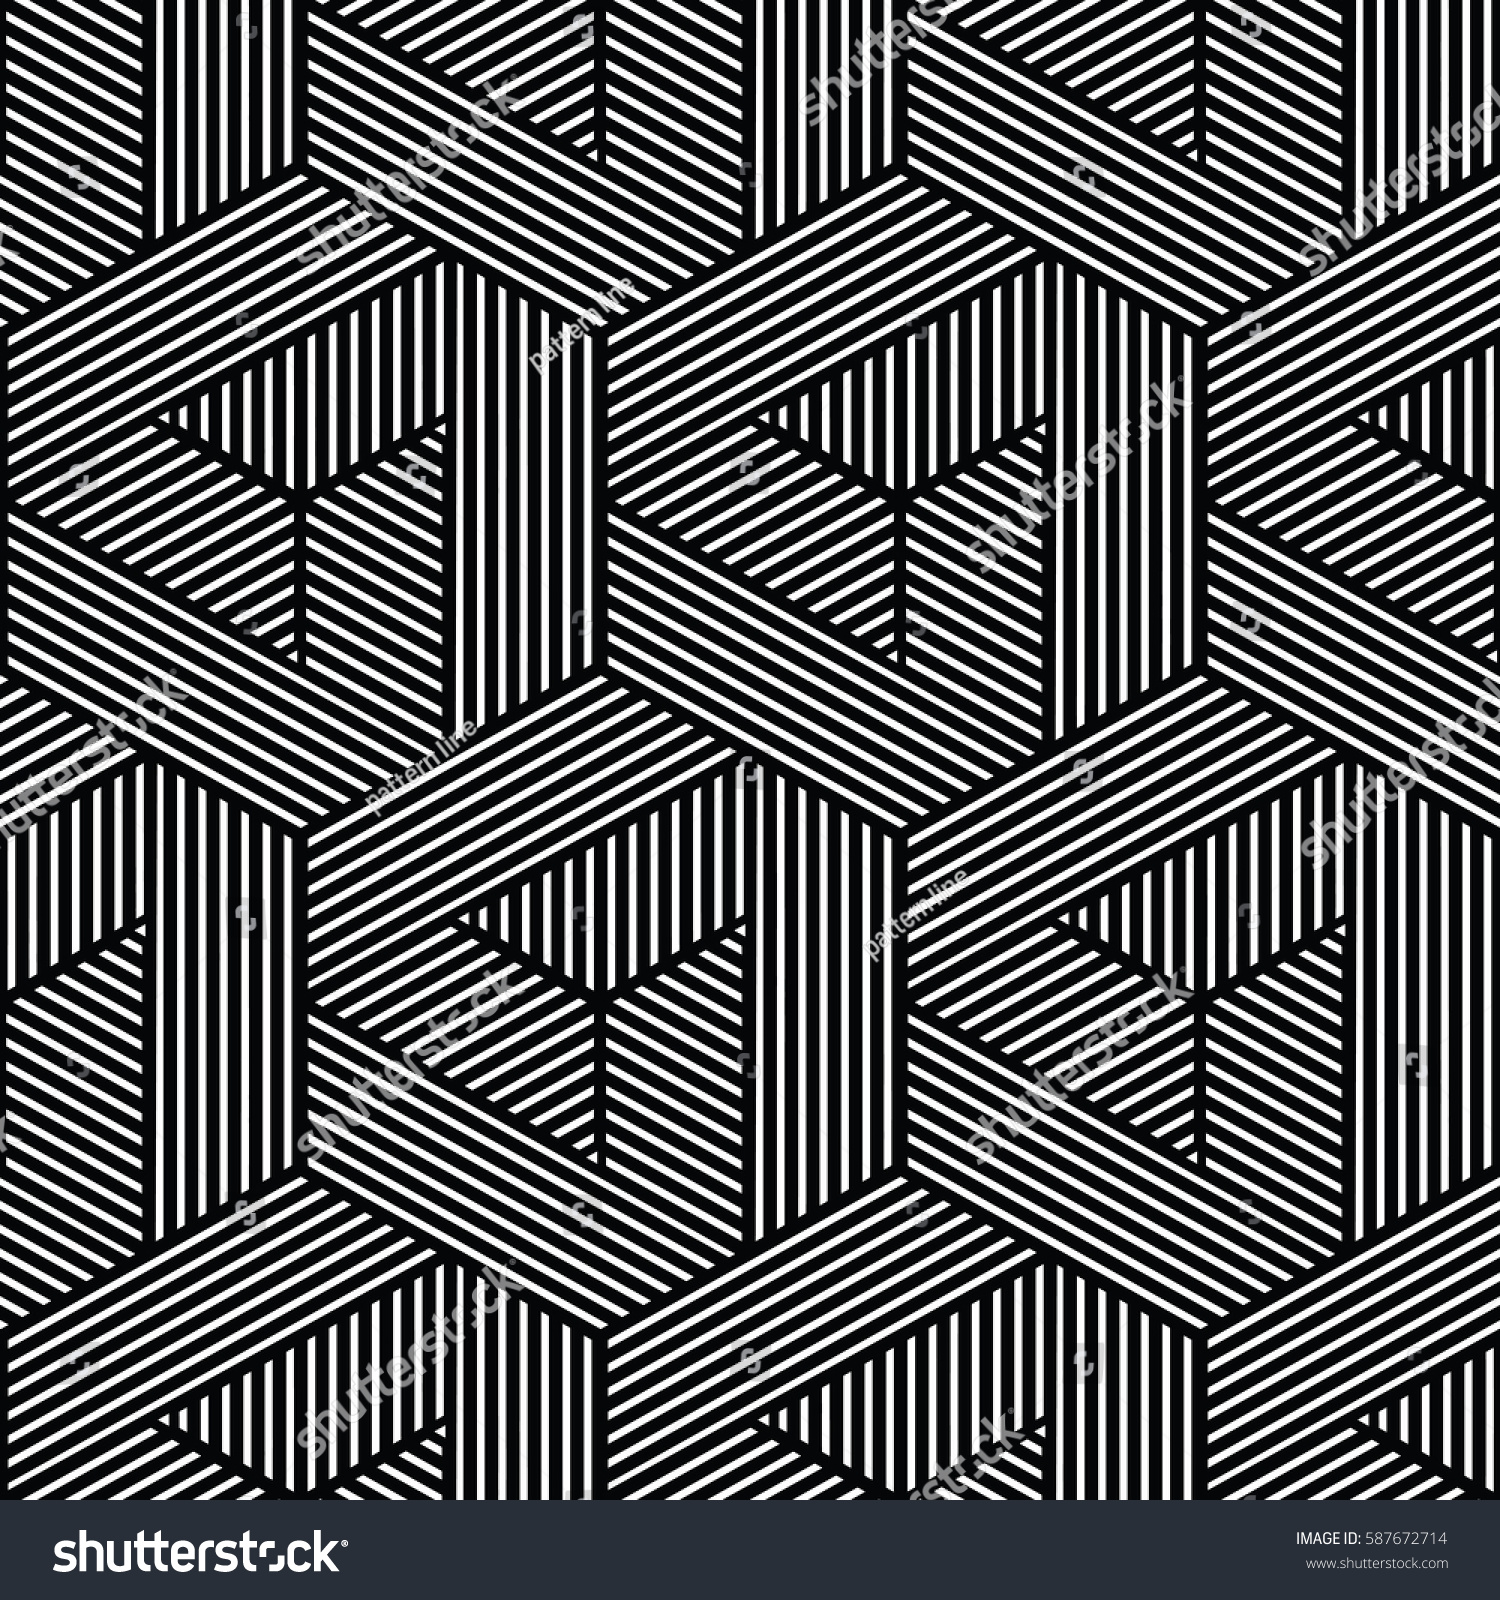 Line Texture Black And White : Black white patternbackground line geometricmodern stylish